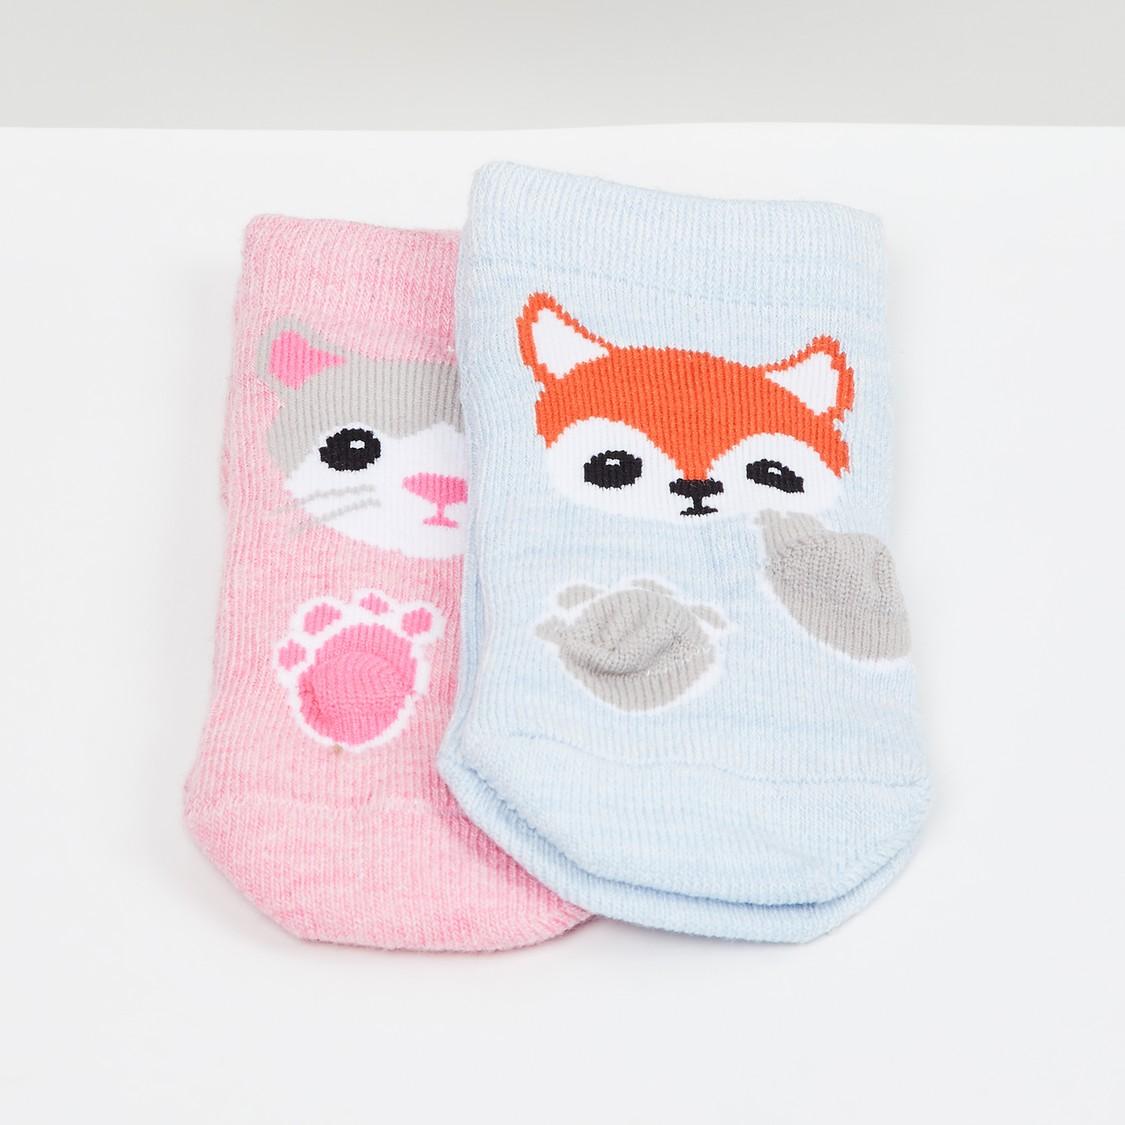 MAX Kids Woven Design Socks- Set of 2 - 2-4 Y